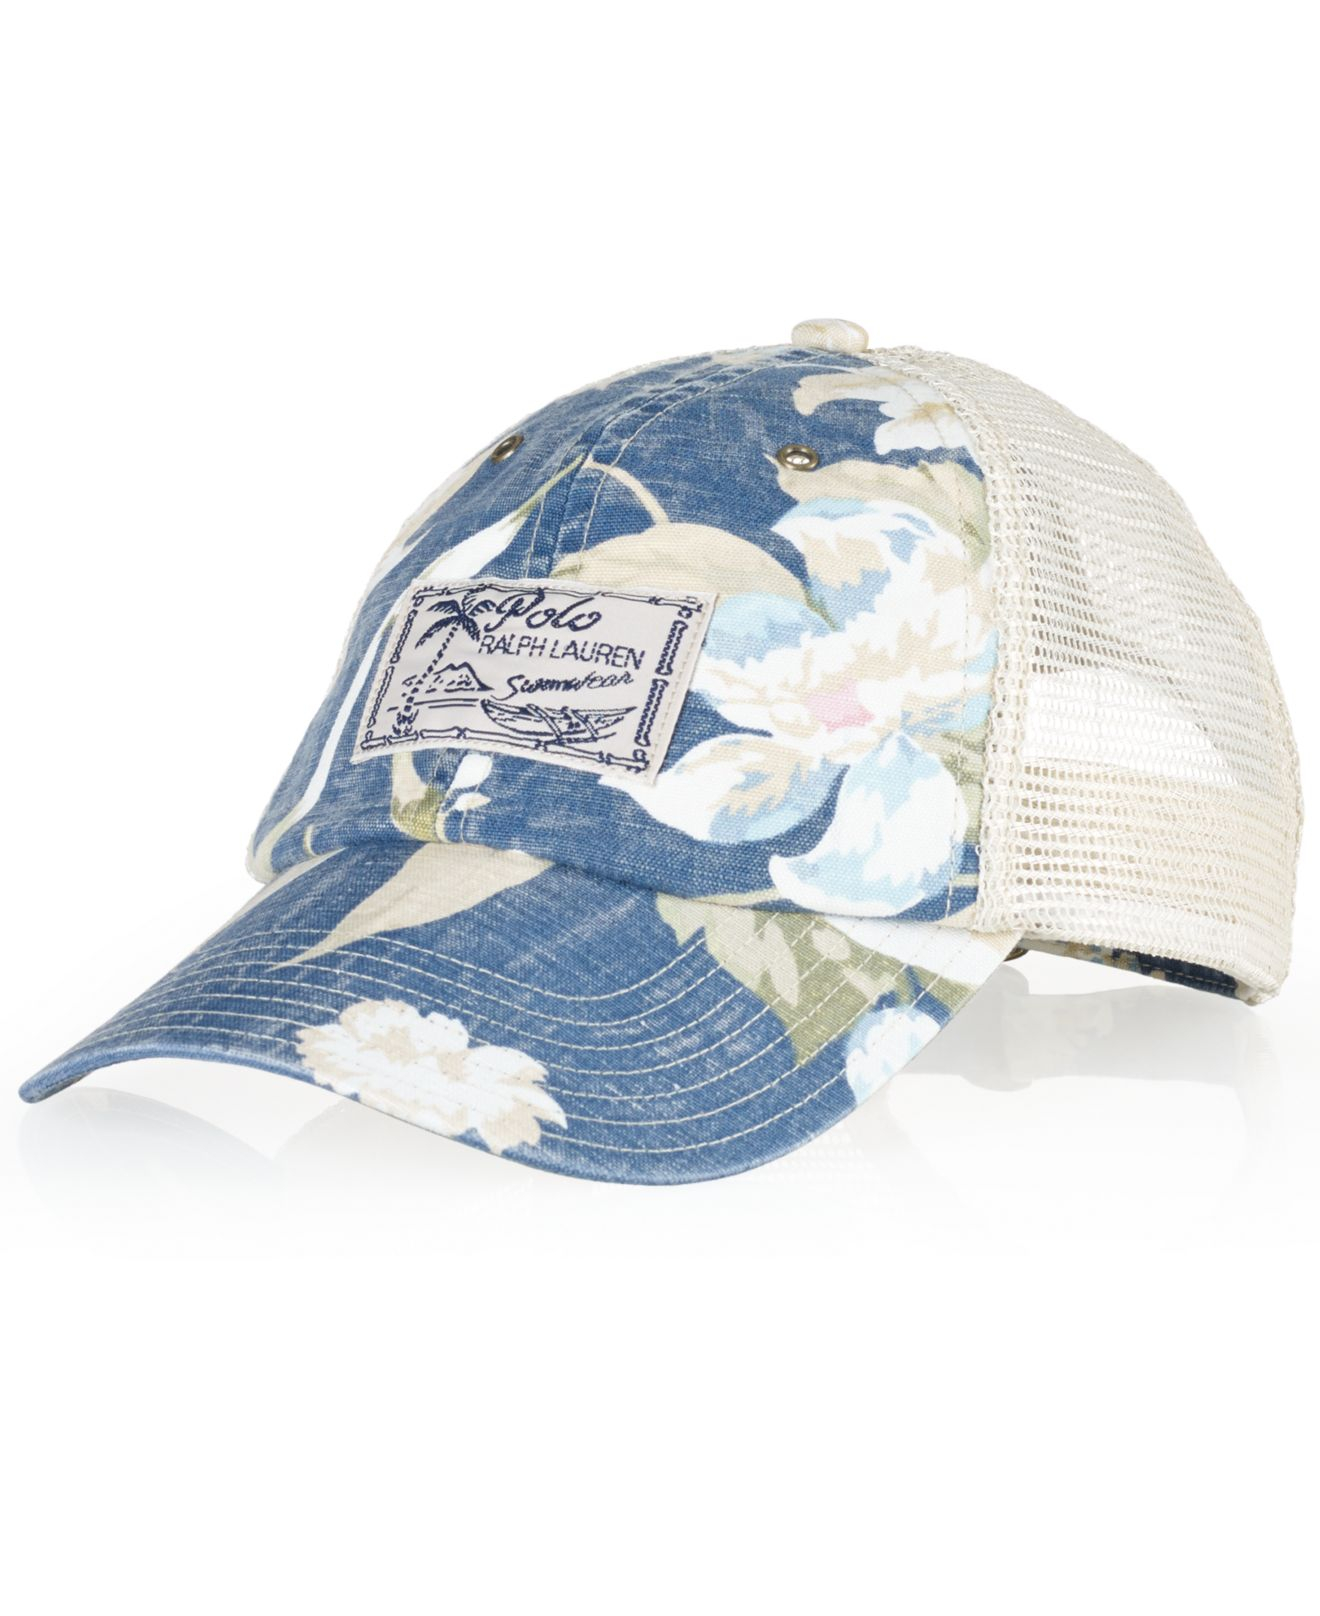 Lyst - Polo Ralph Lauren Floral Trucker Hat in Blue for Men bb8c4da8c53